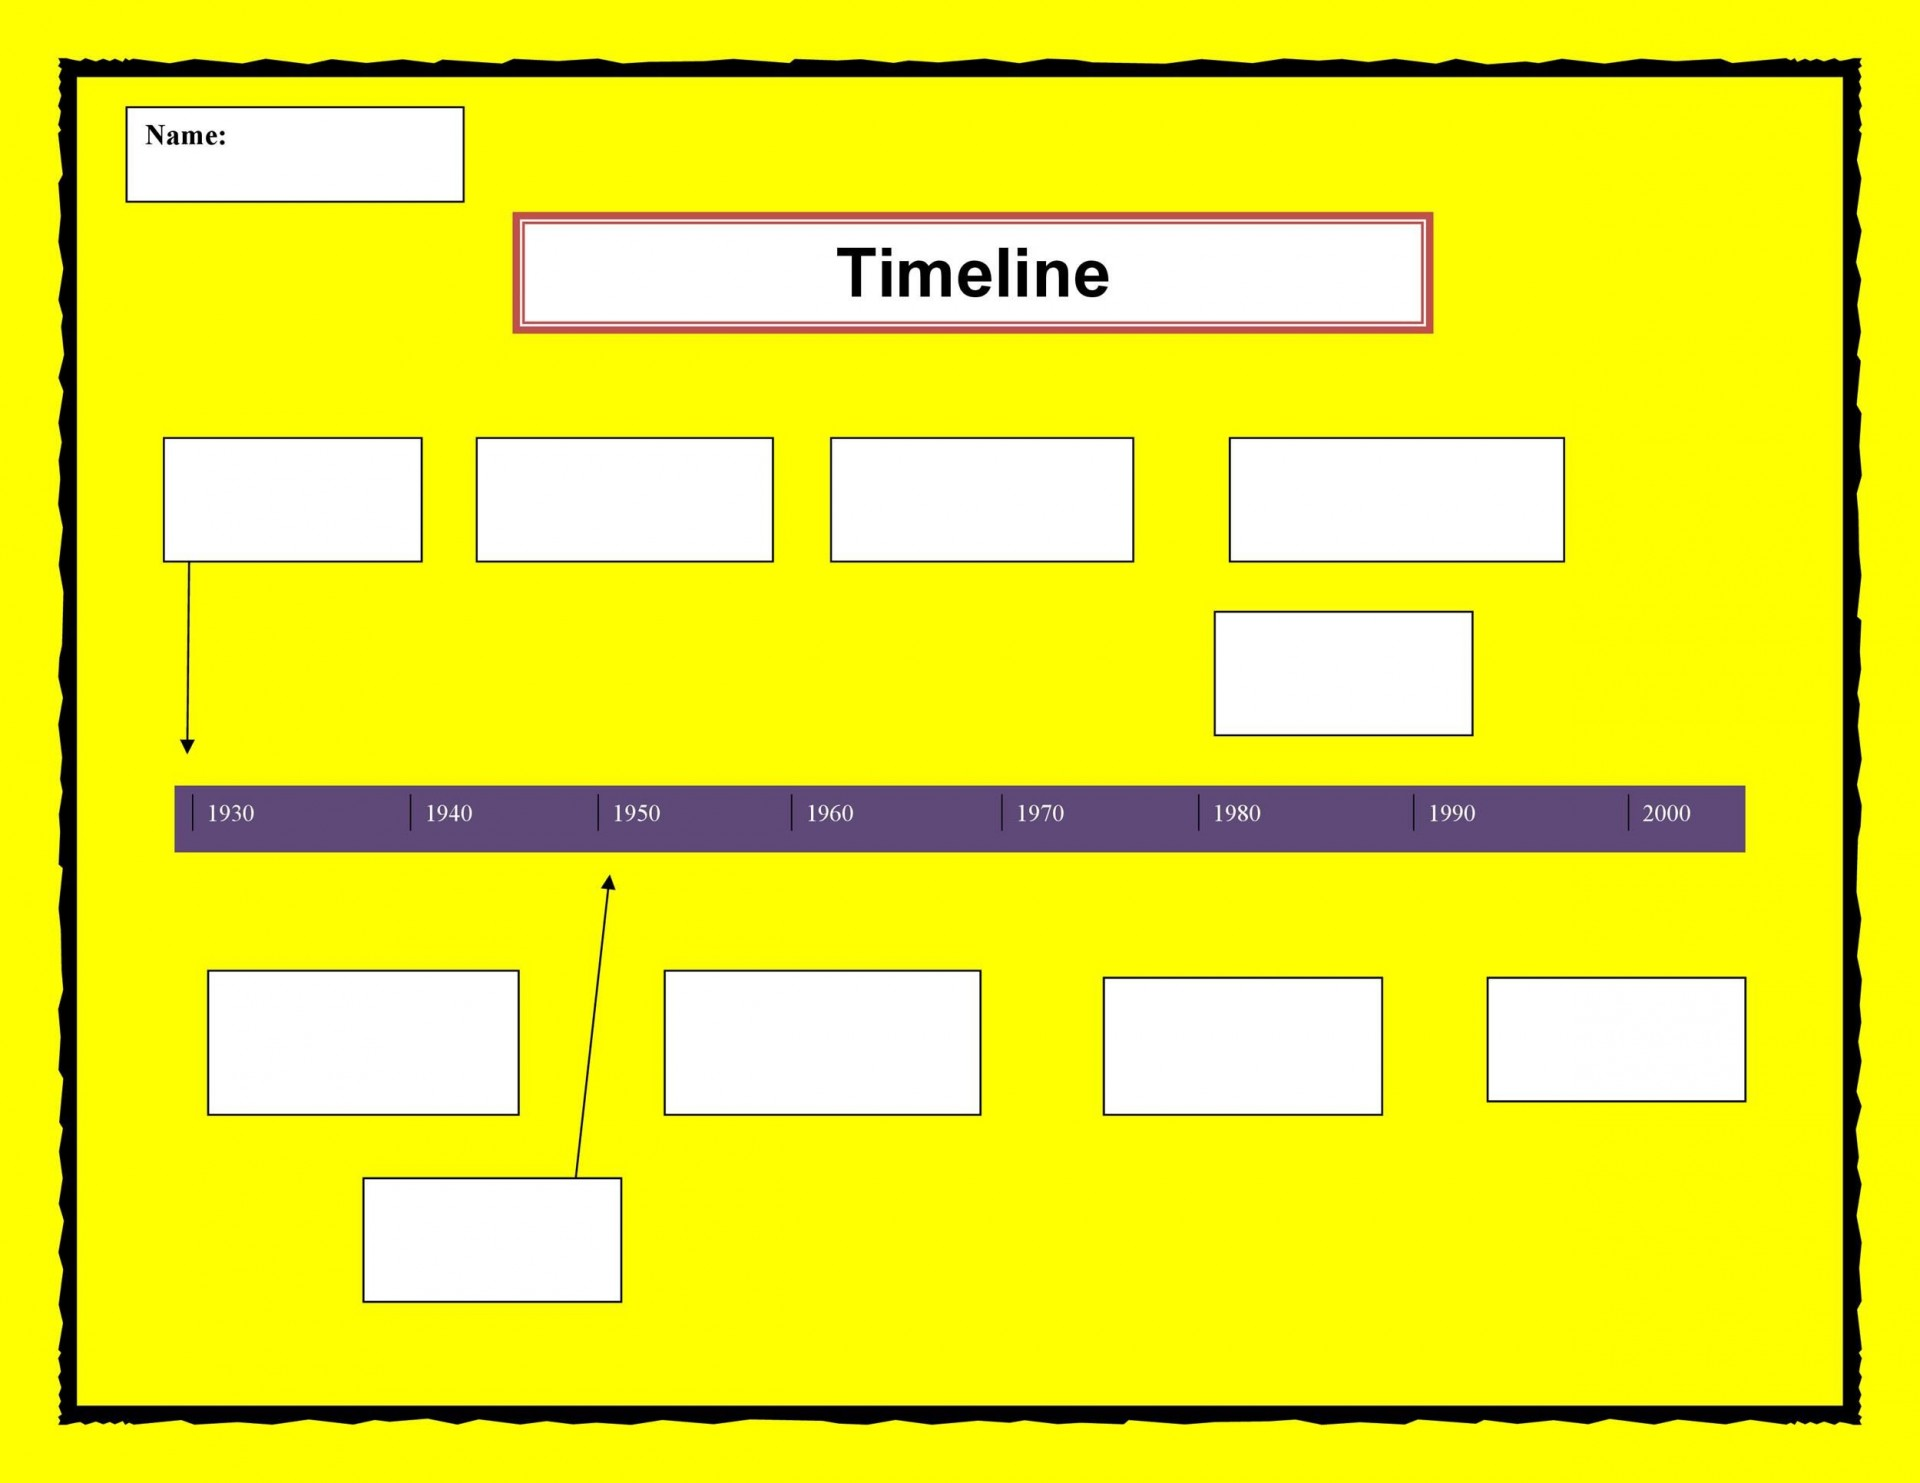 005 Simple Timeline Template For Word Sample  Wordpres Free1920